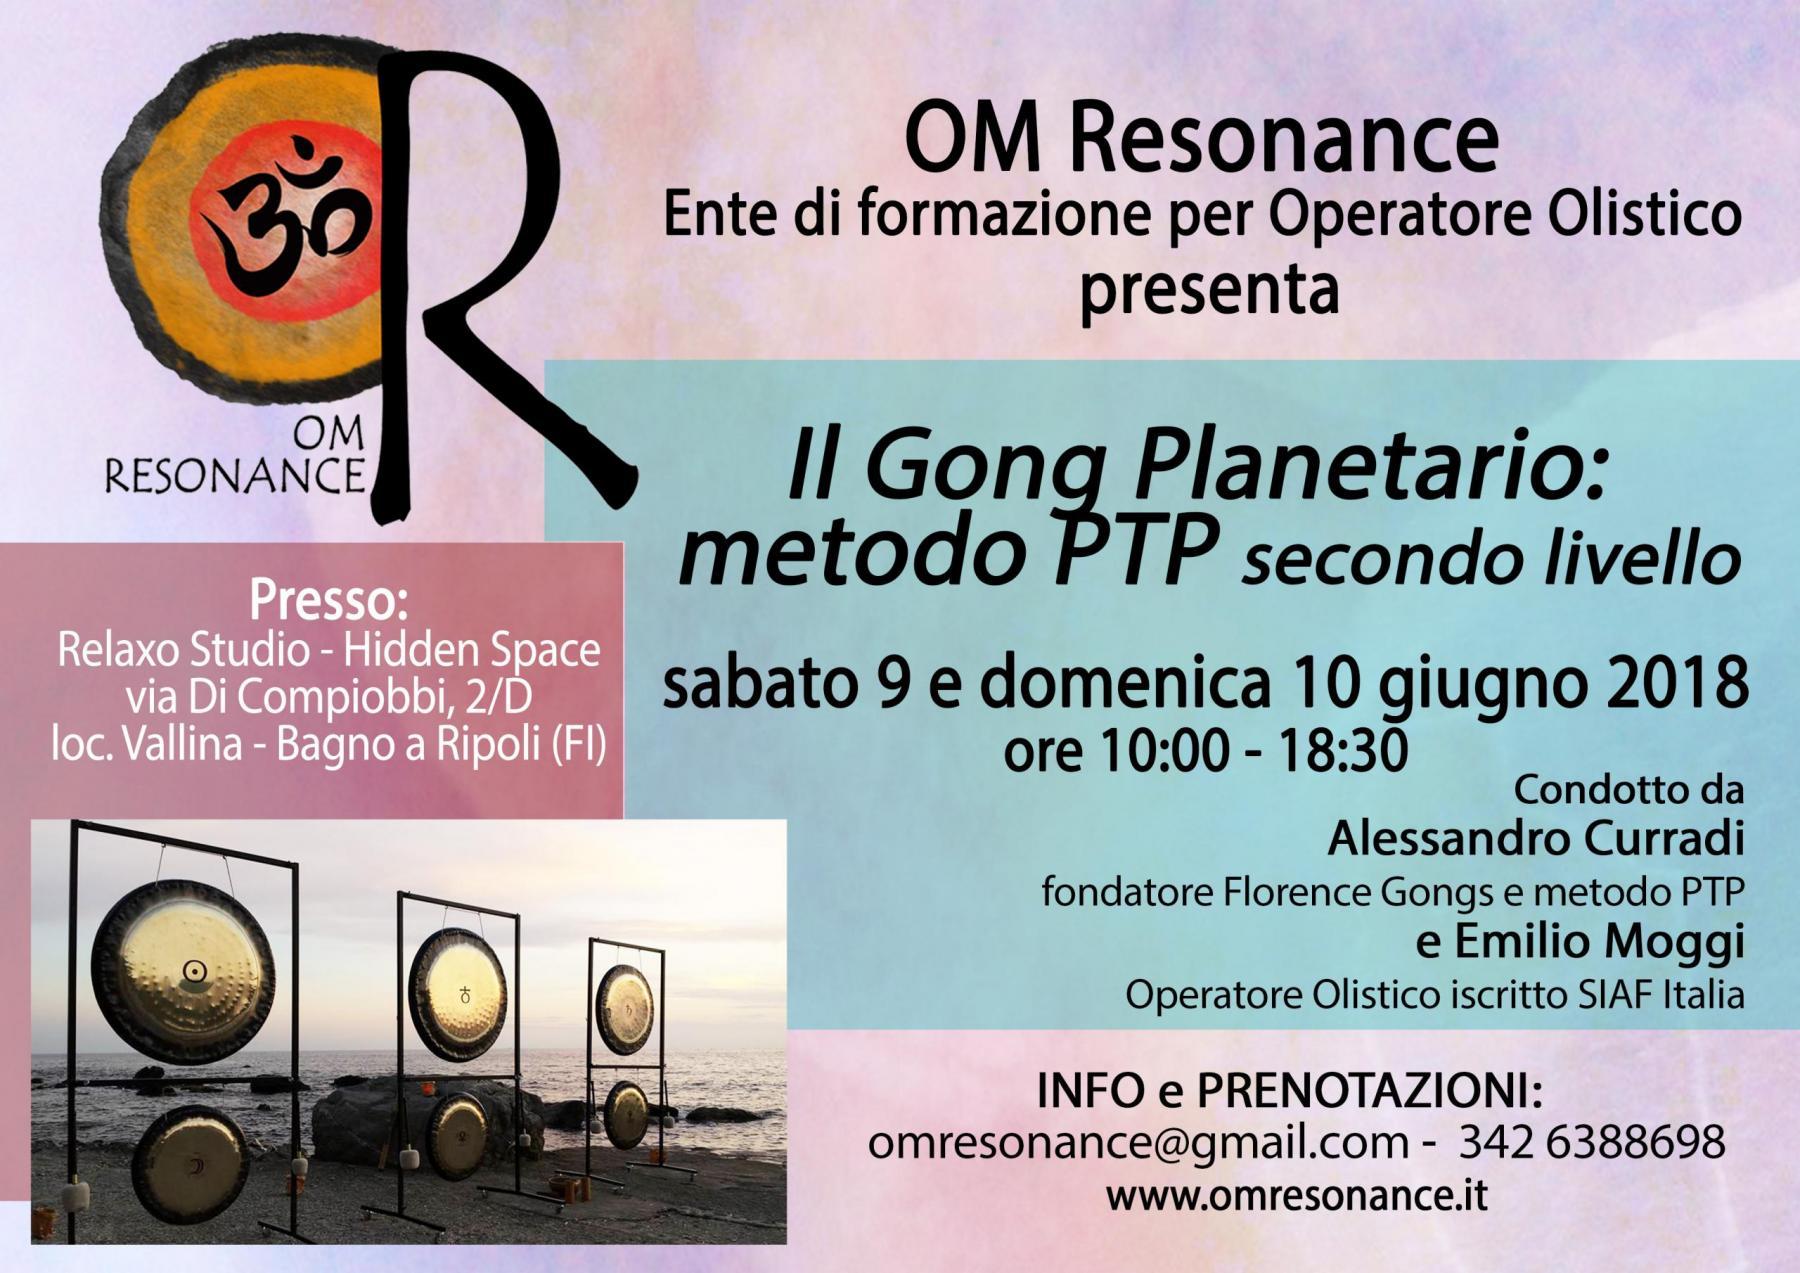 gong planetario secondo livello om resonance firernze